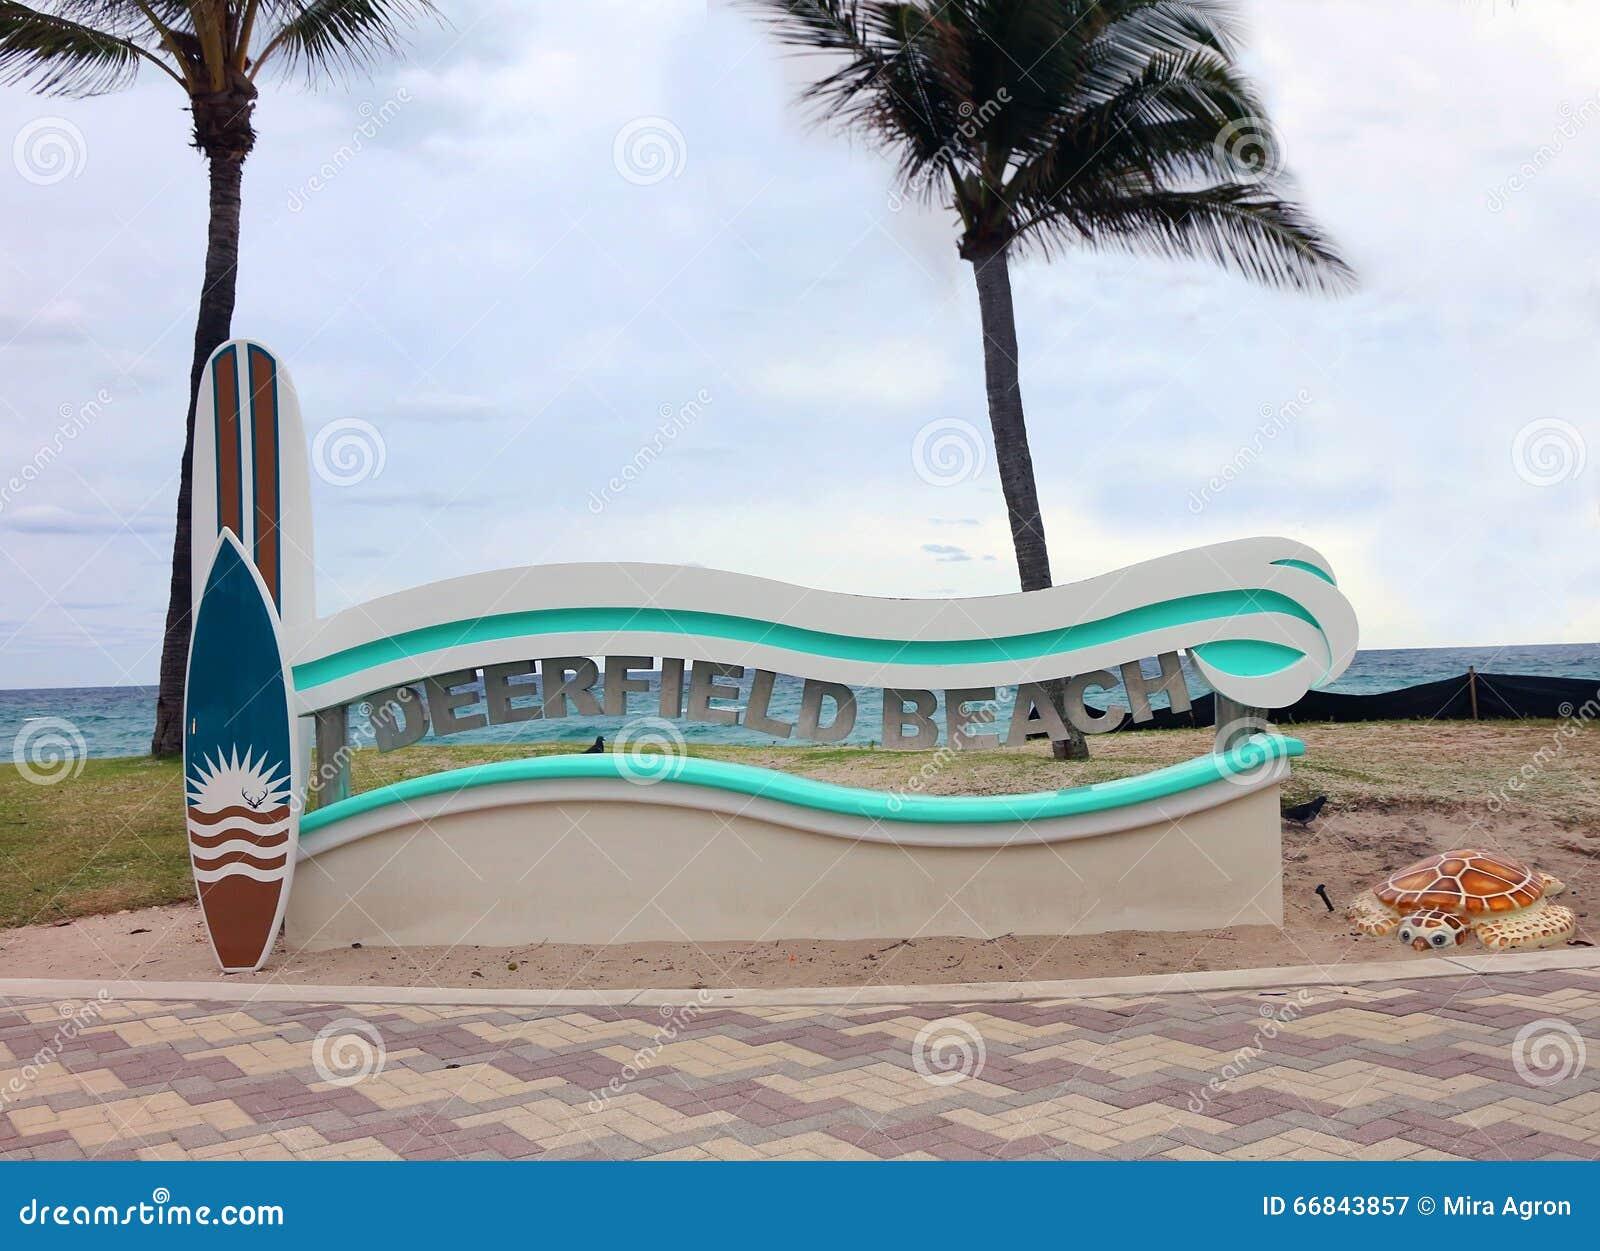 Sinal da praia de Deerfield